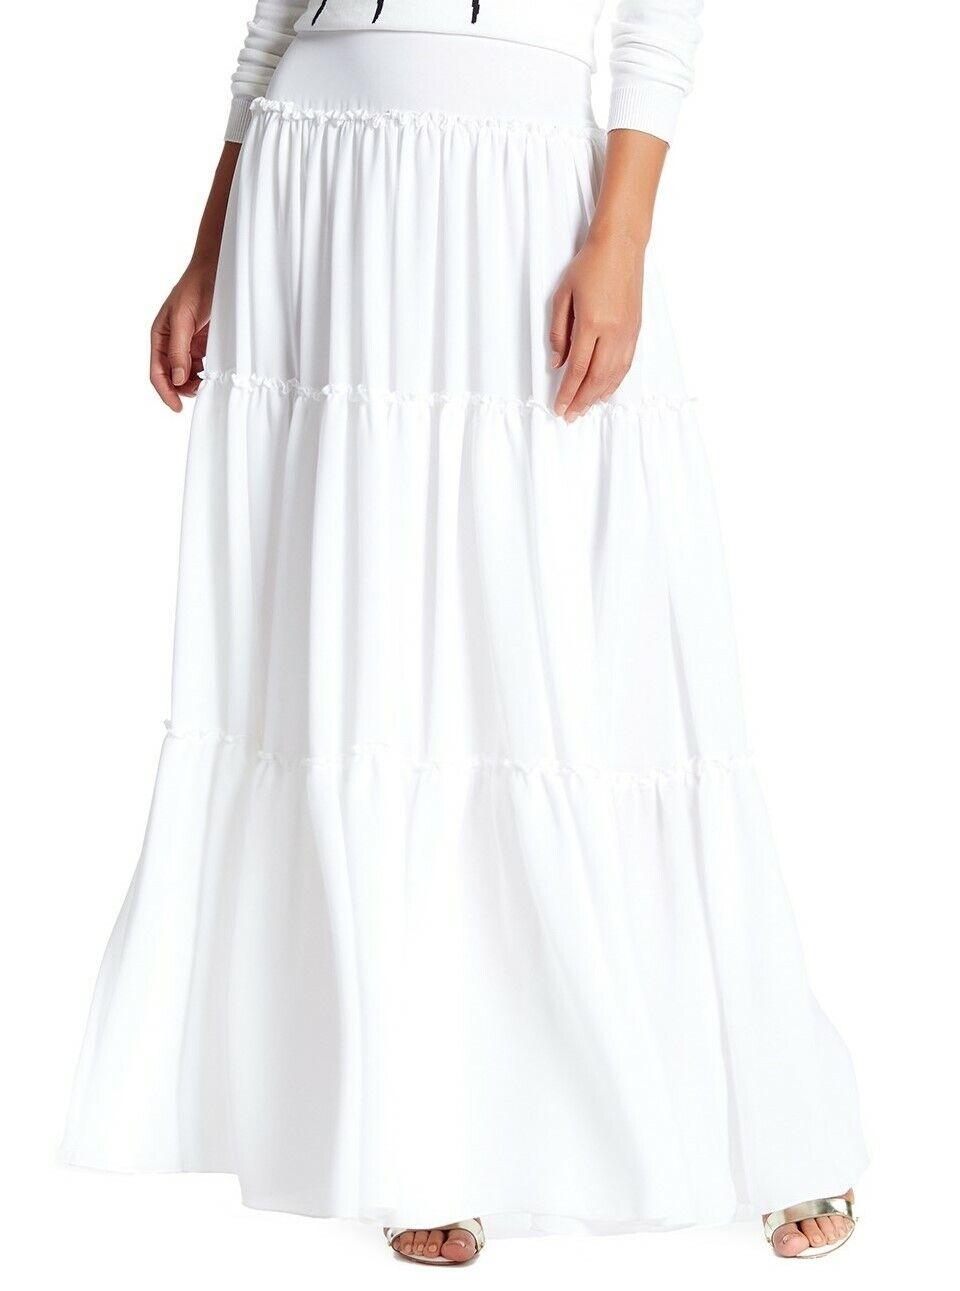 Alice + olivia 153139 Women's Isobel Ruffle Tier Peasant Skirt White Sz. 10